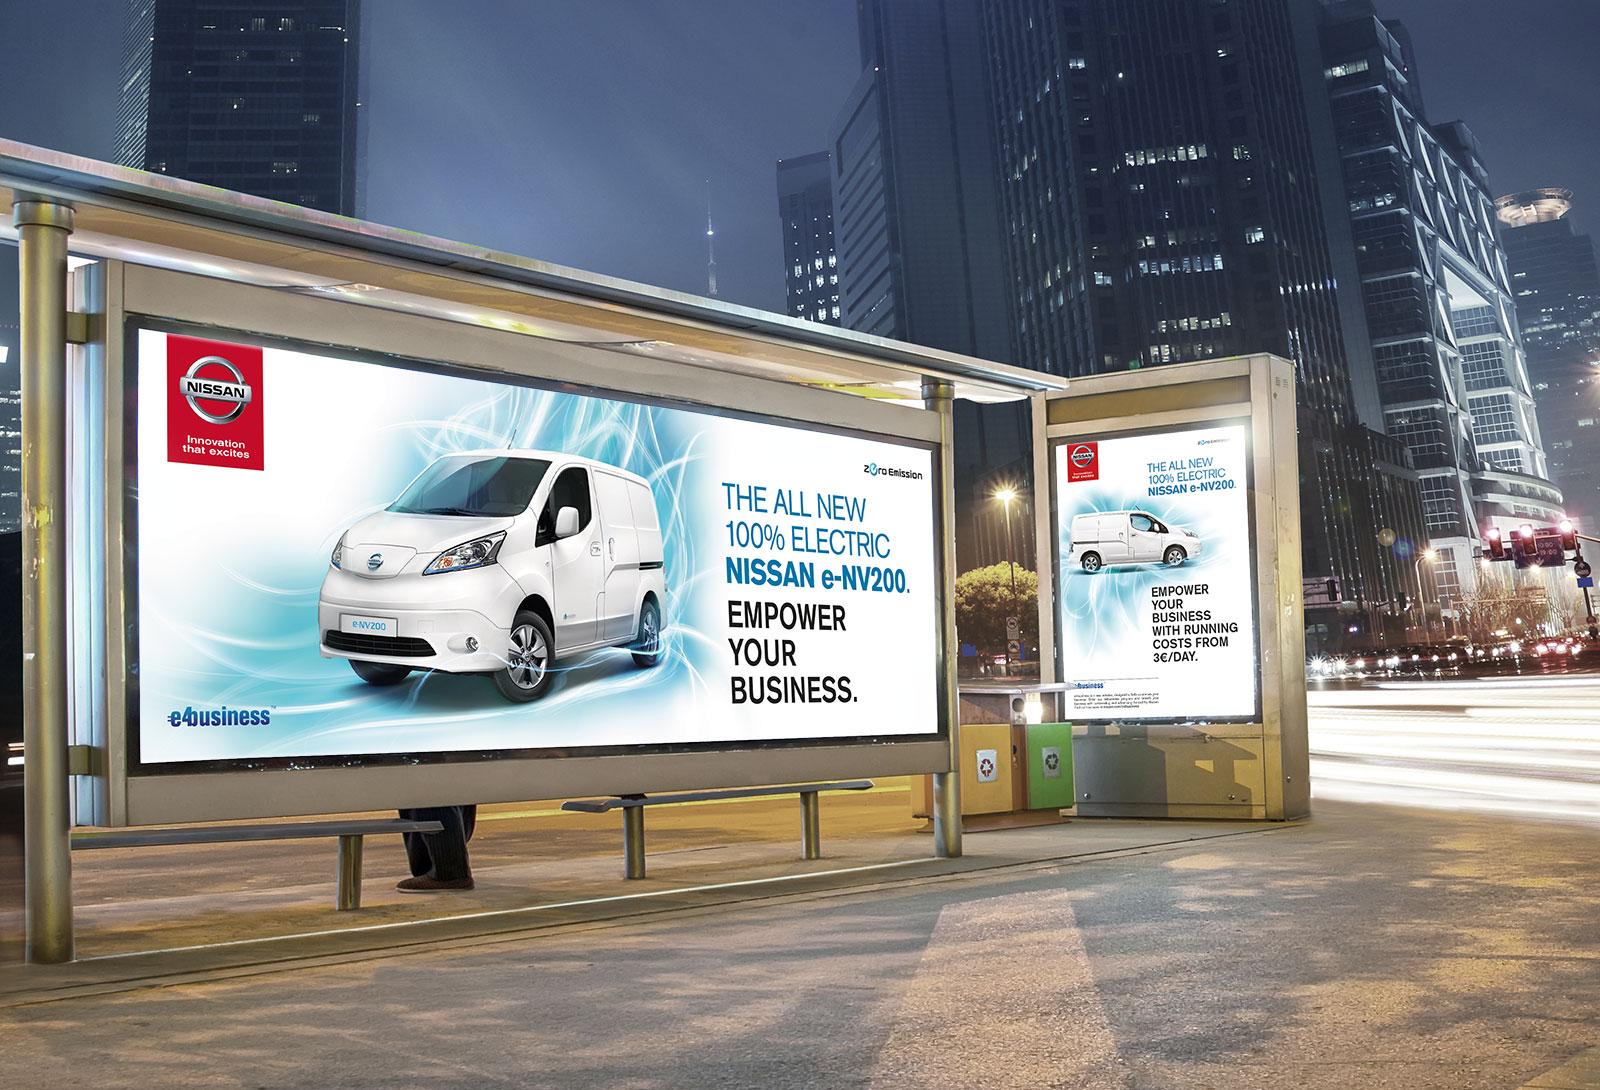 billboards-env200.jpg